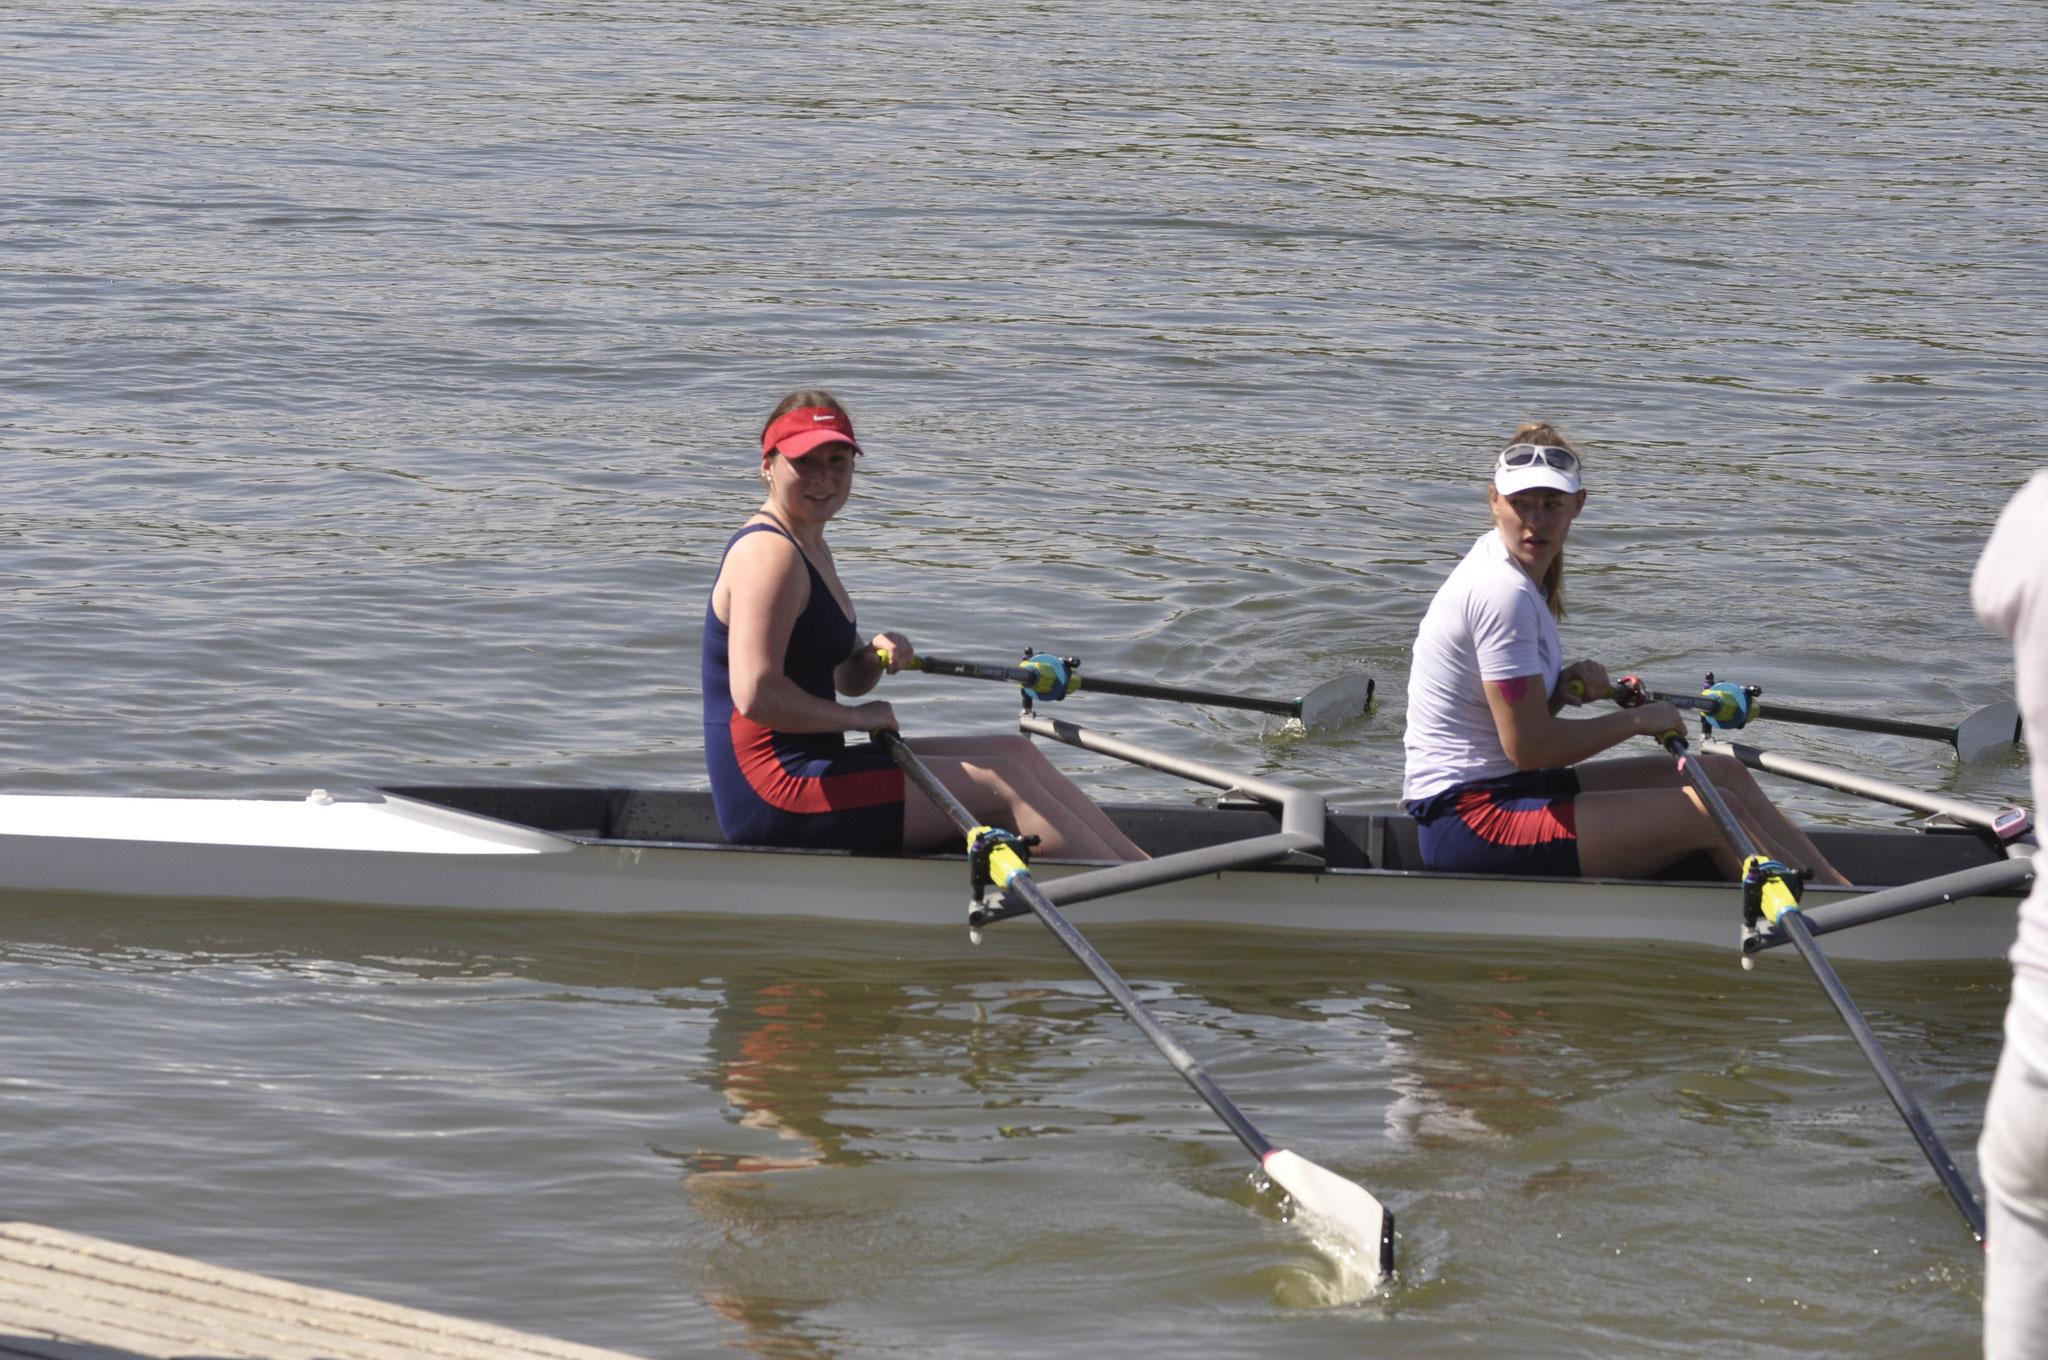 Sieger im Frauen Doppelzweier des DRCD l. Lisa Sebald, rechts Sonja Schlosser